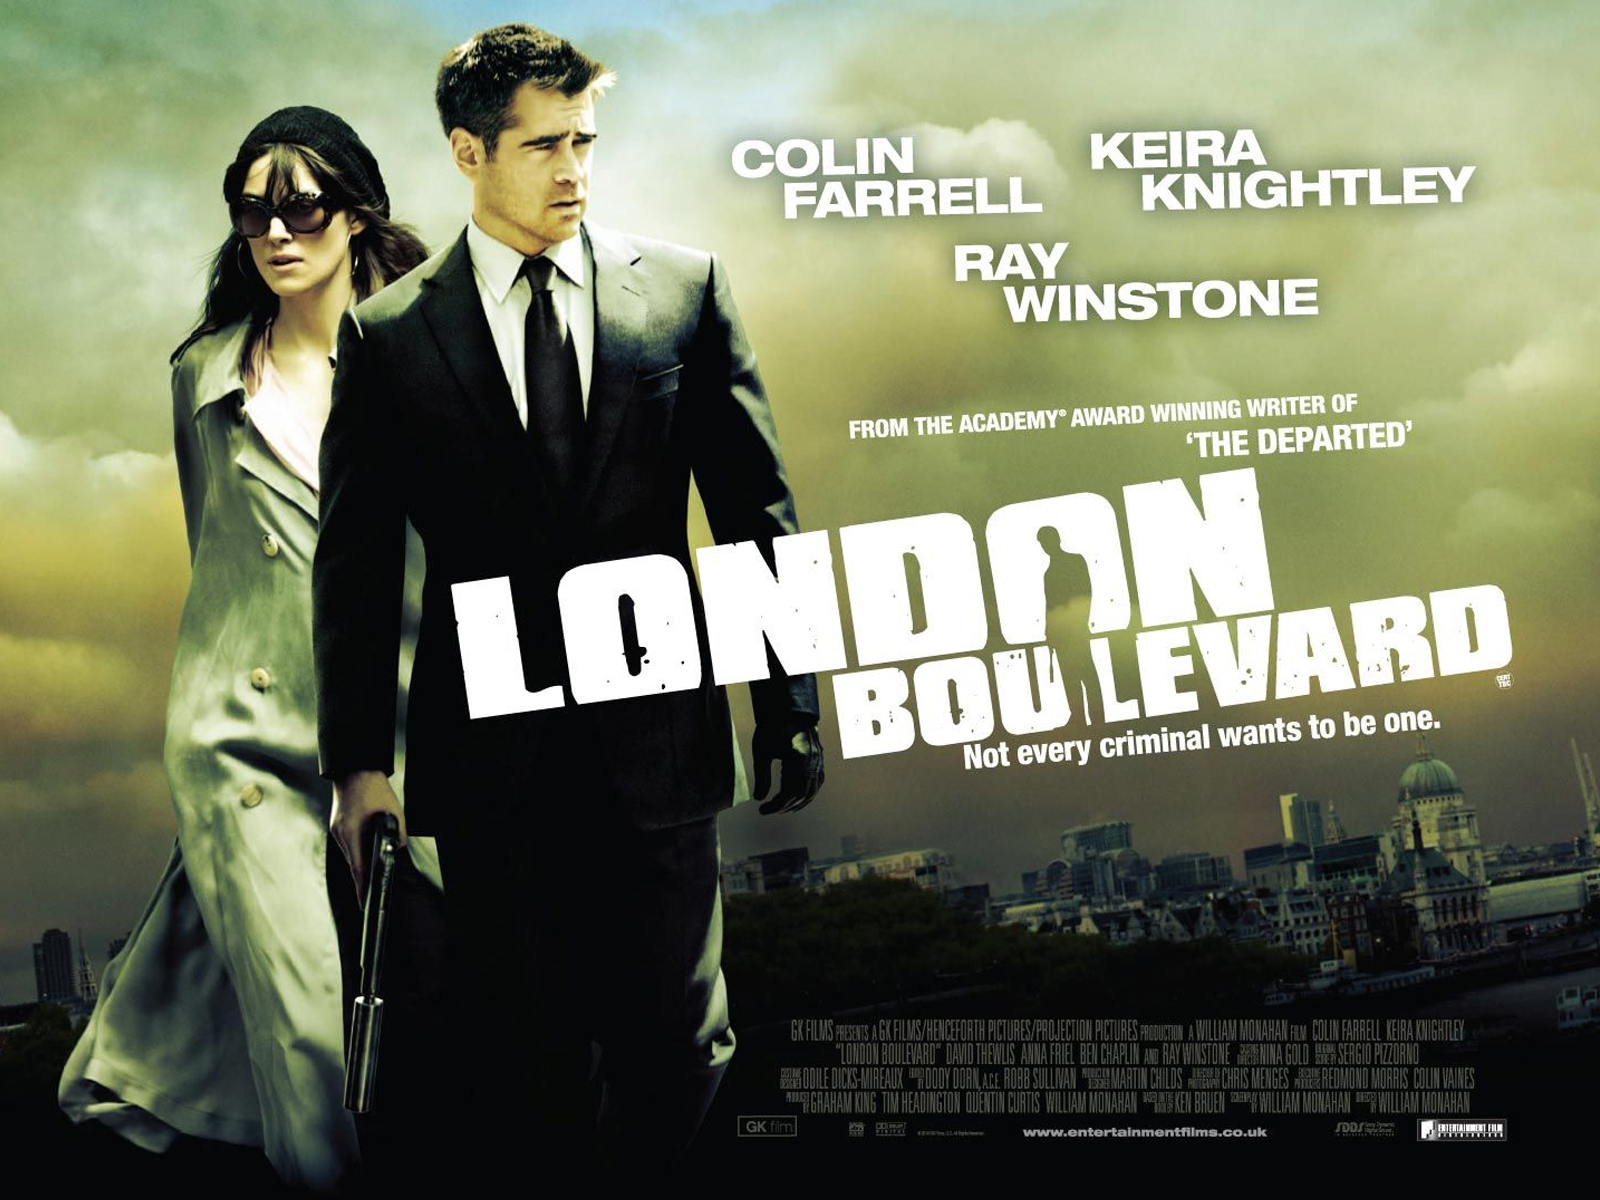 http://2.bp.blogspot.com/_2sQqpEVuOT0/TReUHpZK7zI/AAAAAAAAAHA/vmJ0MhlUNwI/s1600/london-boulevard-movie-poster.jpg